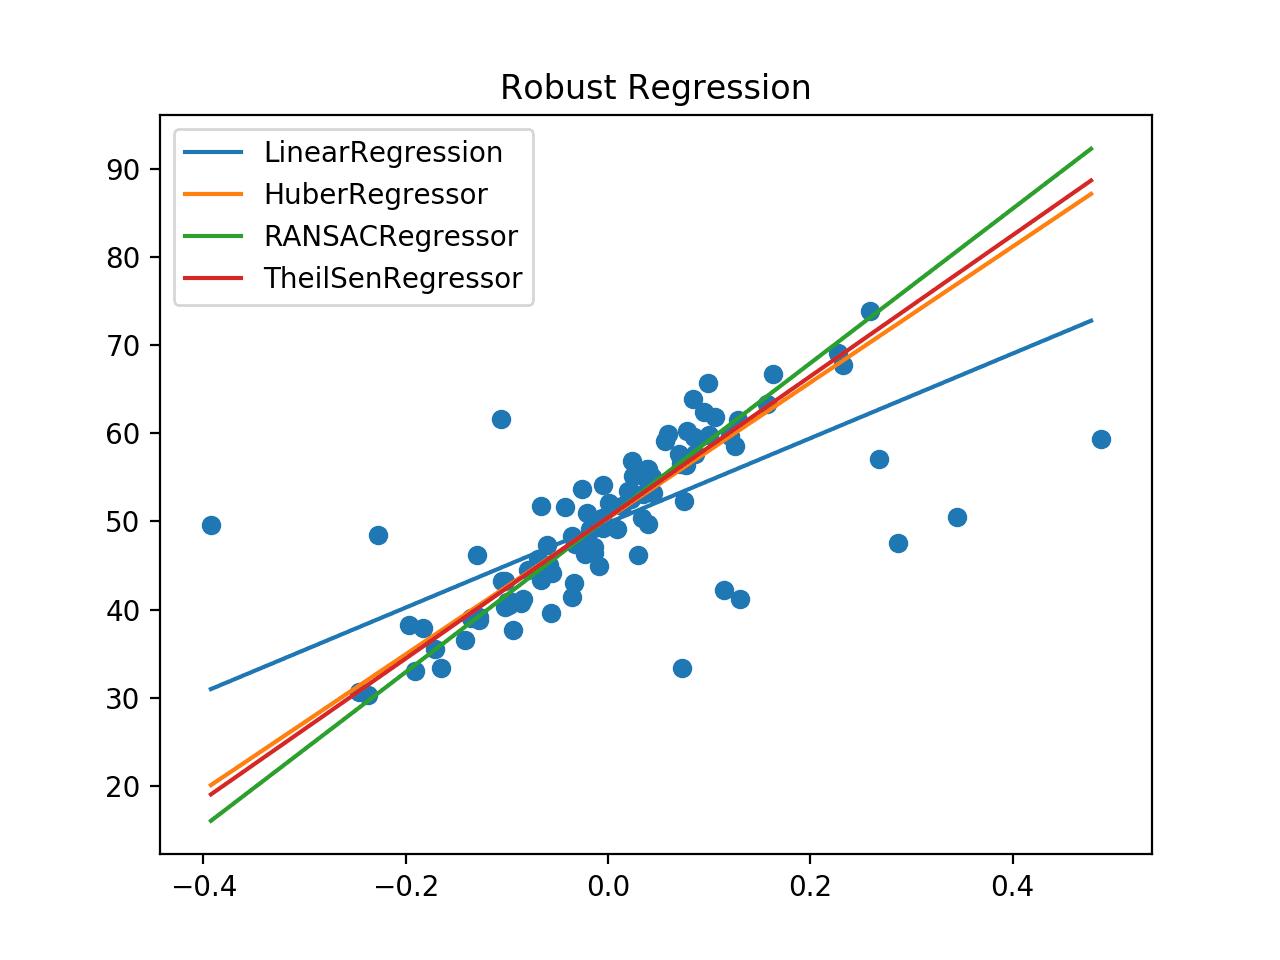 Comparison of Robust Regression Algorithms Line of Best Fit